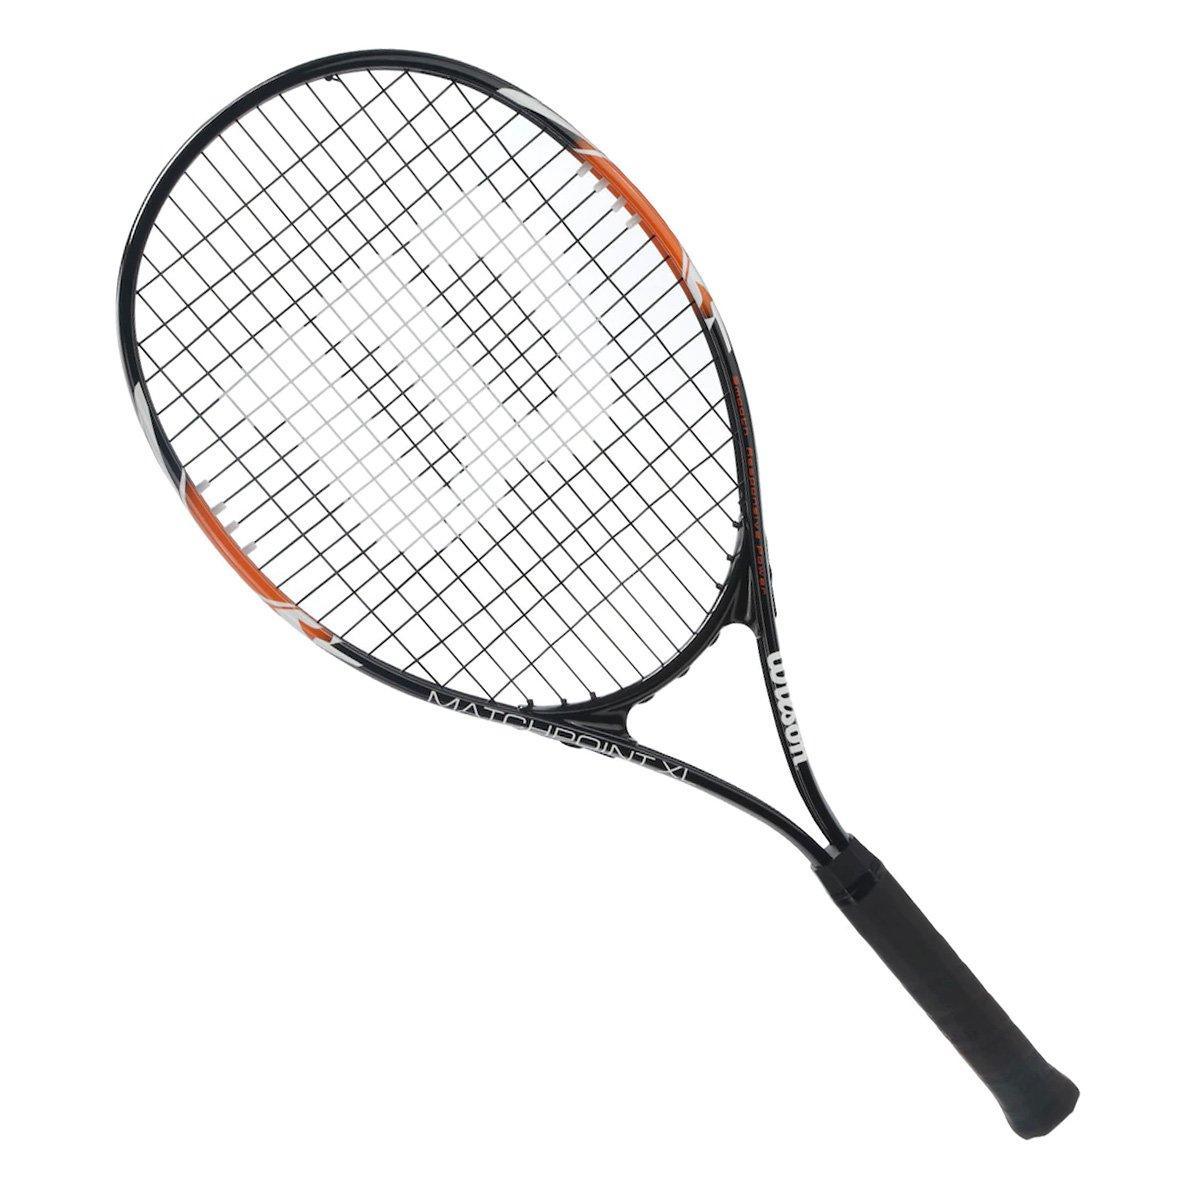 Raquete Mania   Raquete de Tênis Wilson   Matchpoint XL 15bc3e331eeb4